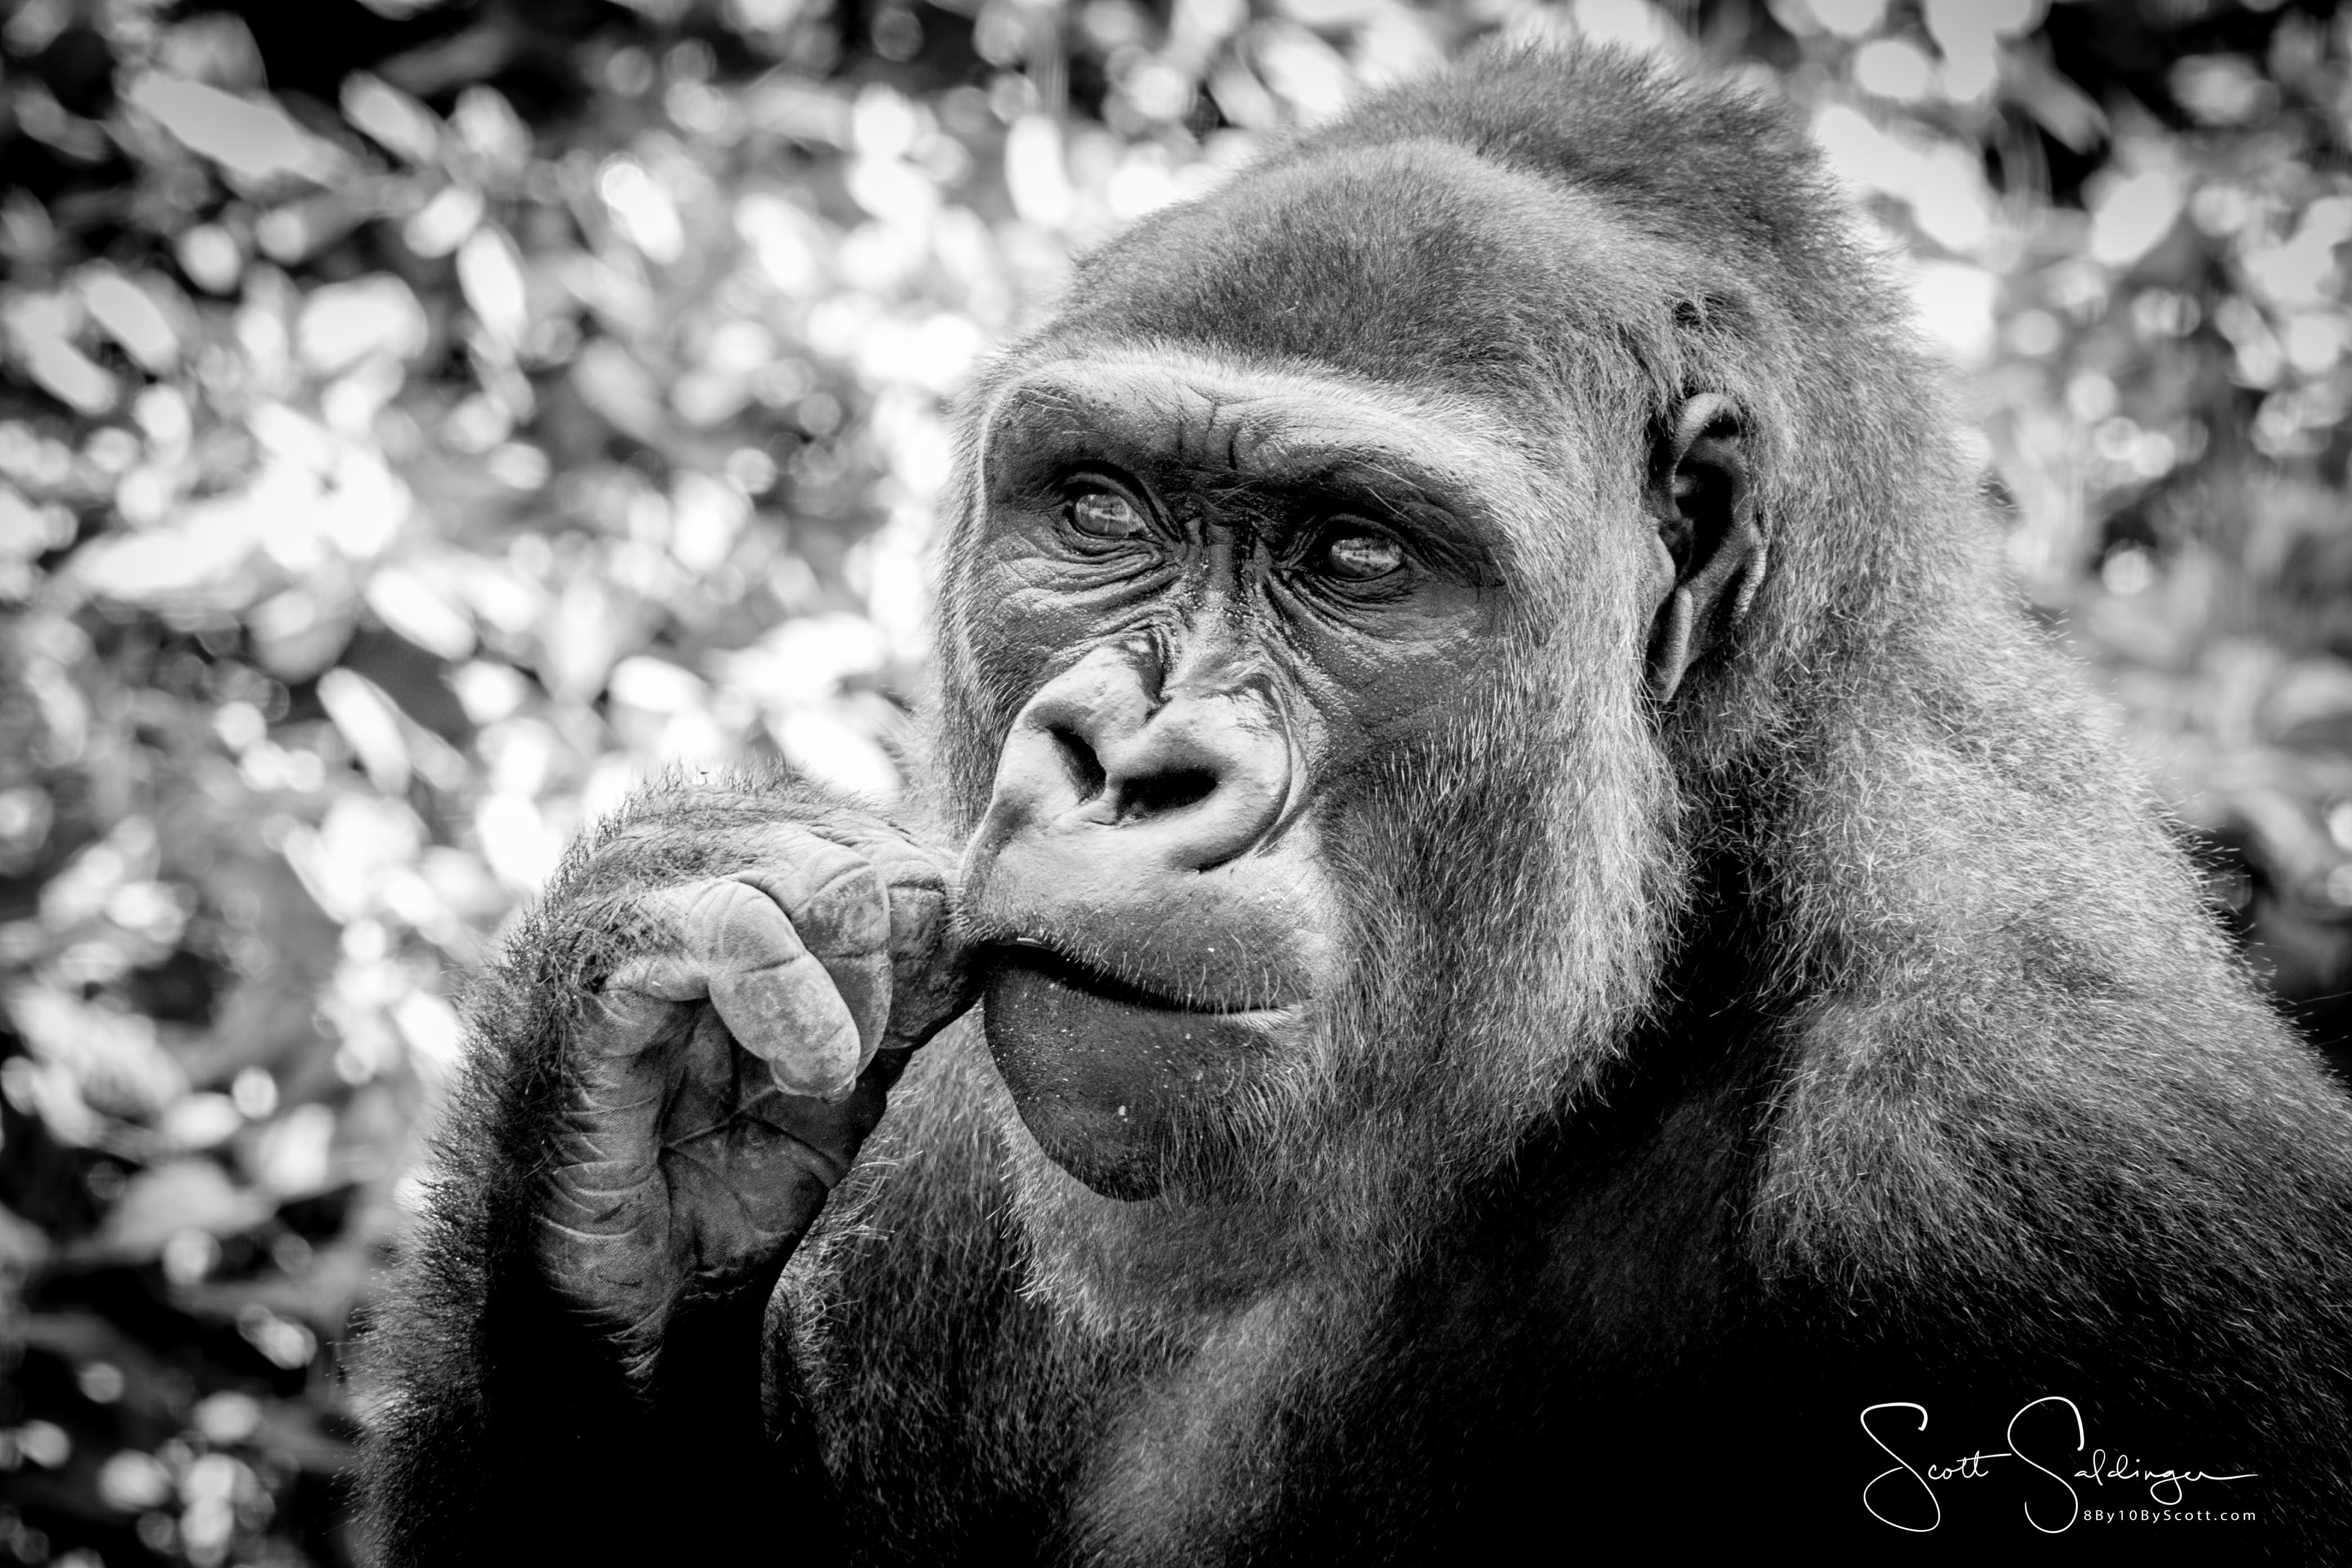 Apes-5640